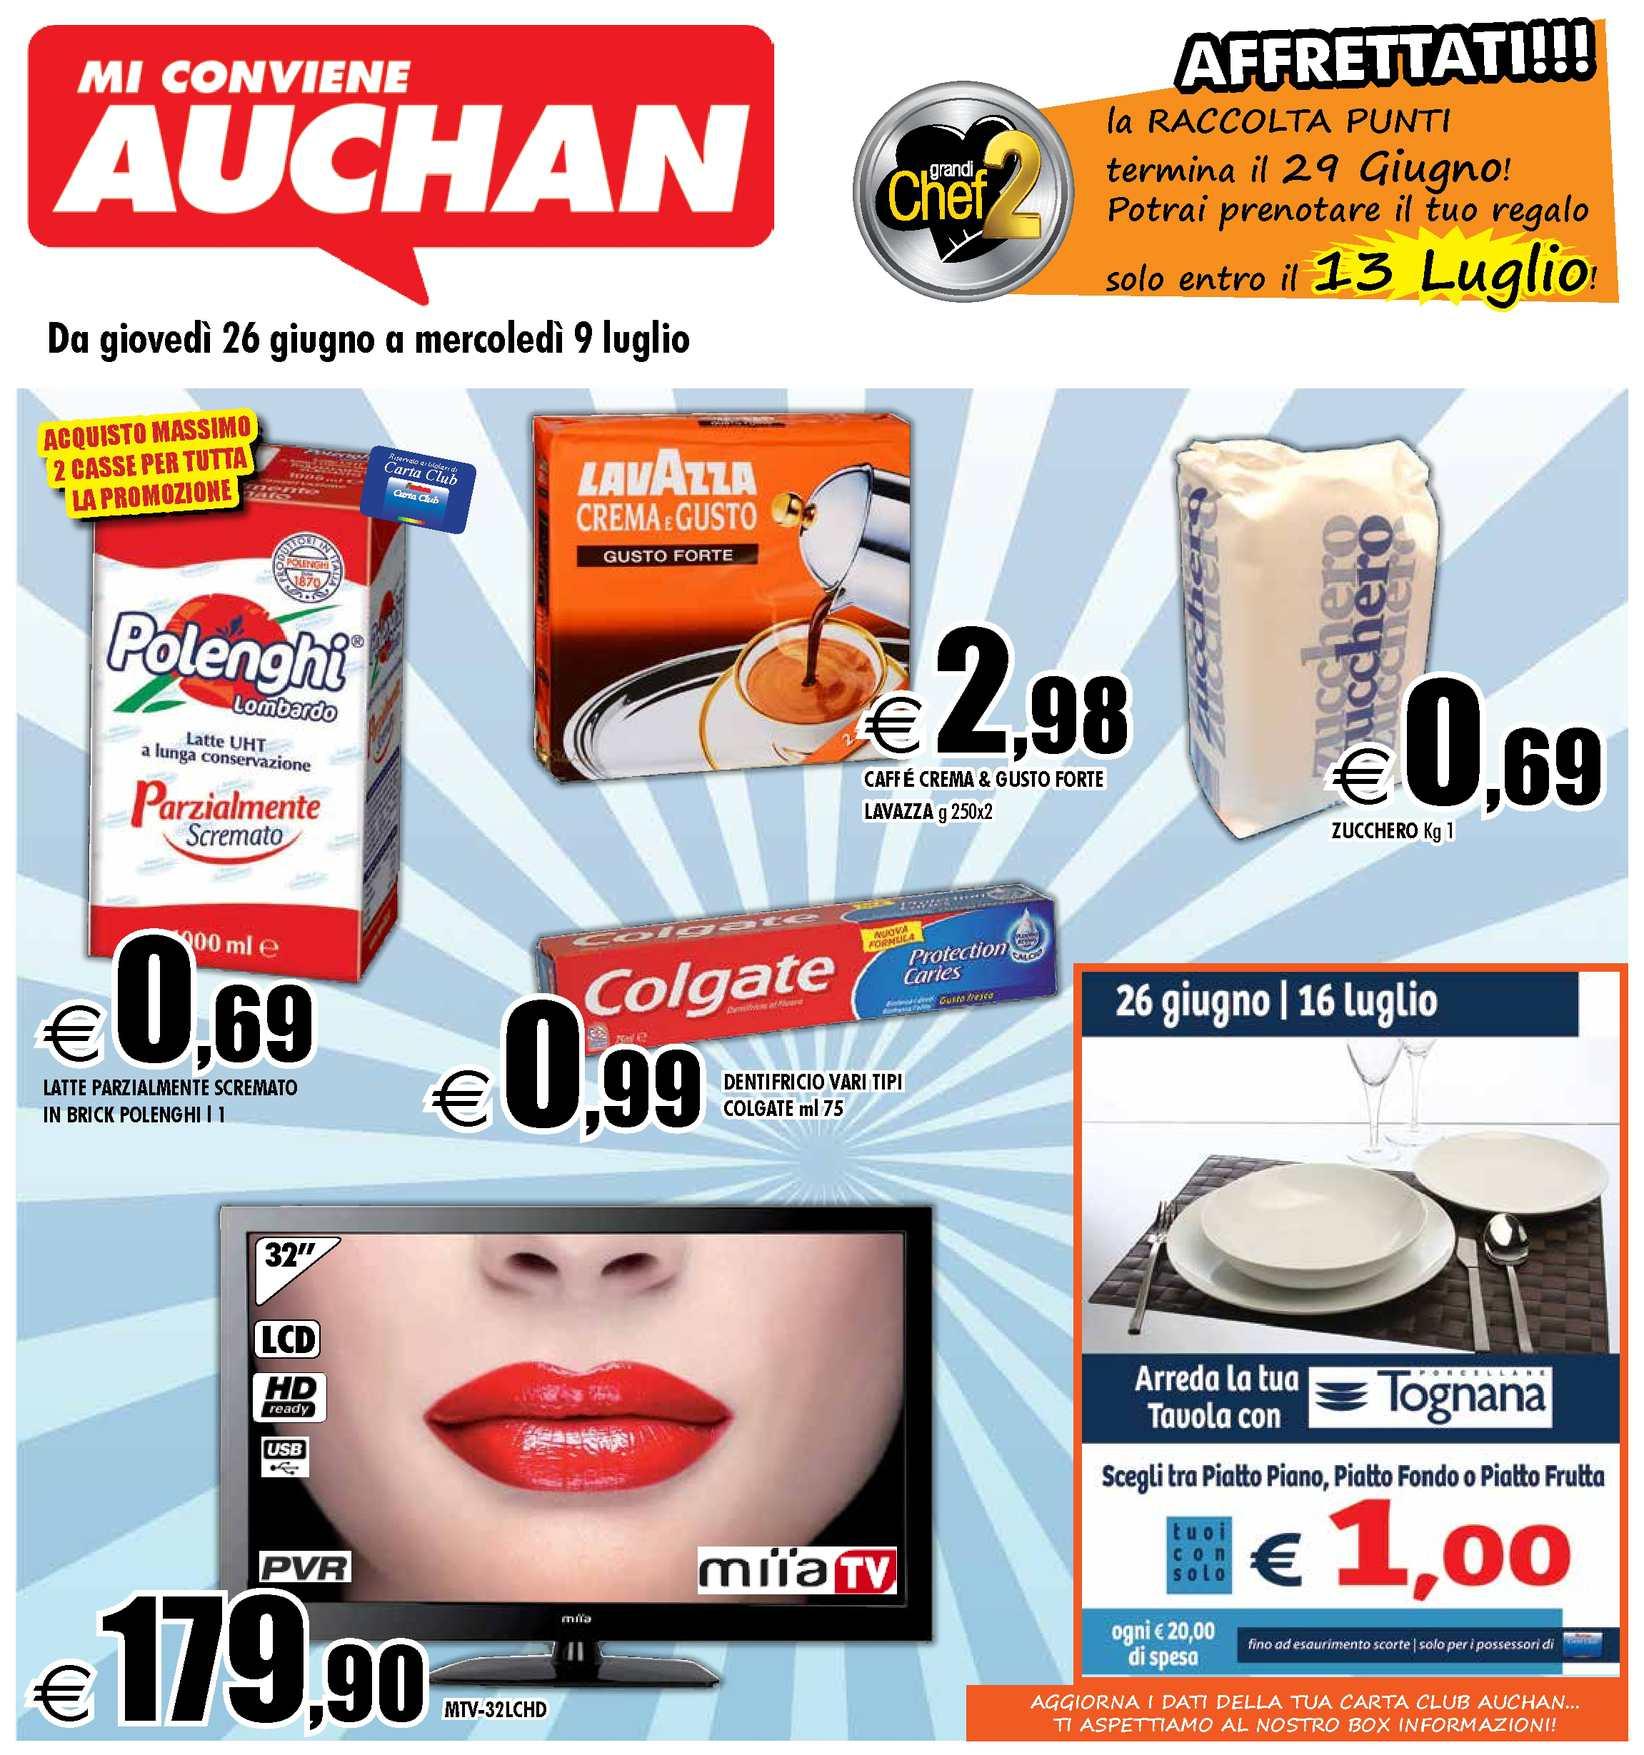 Divano Letto Gonfiabile Auchan.Calameo Volantino Auchan Calabria 26giu 9lug